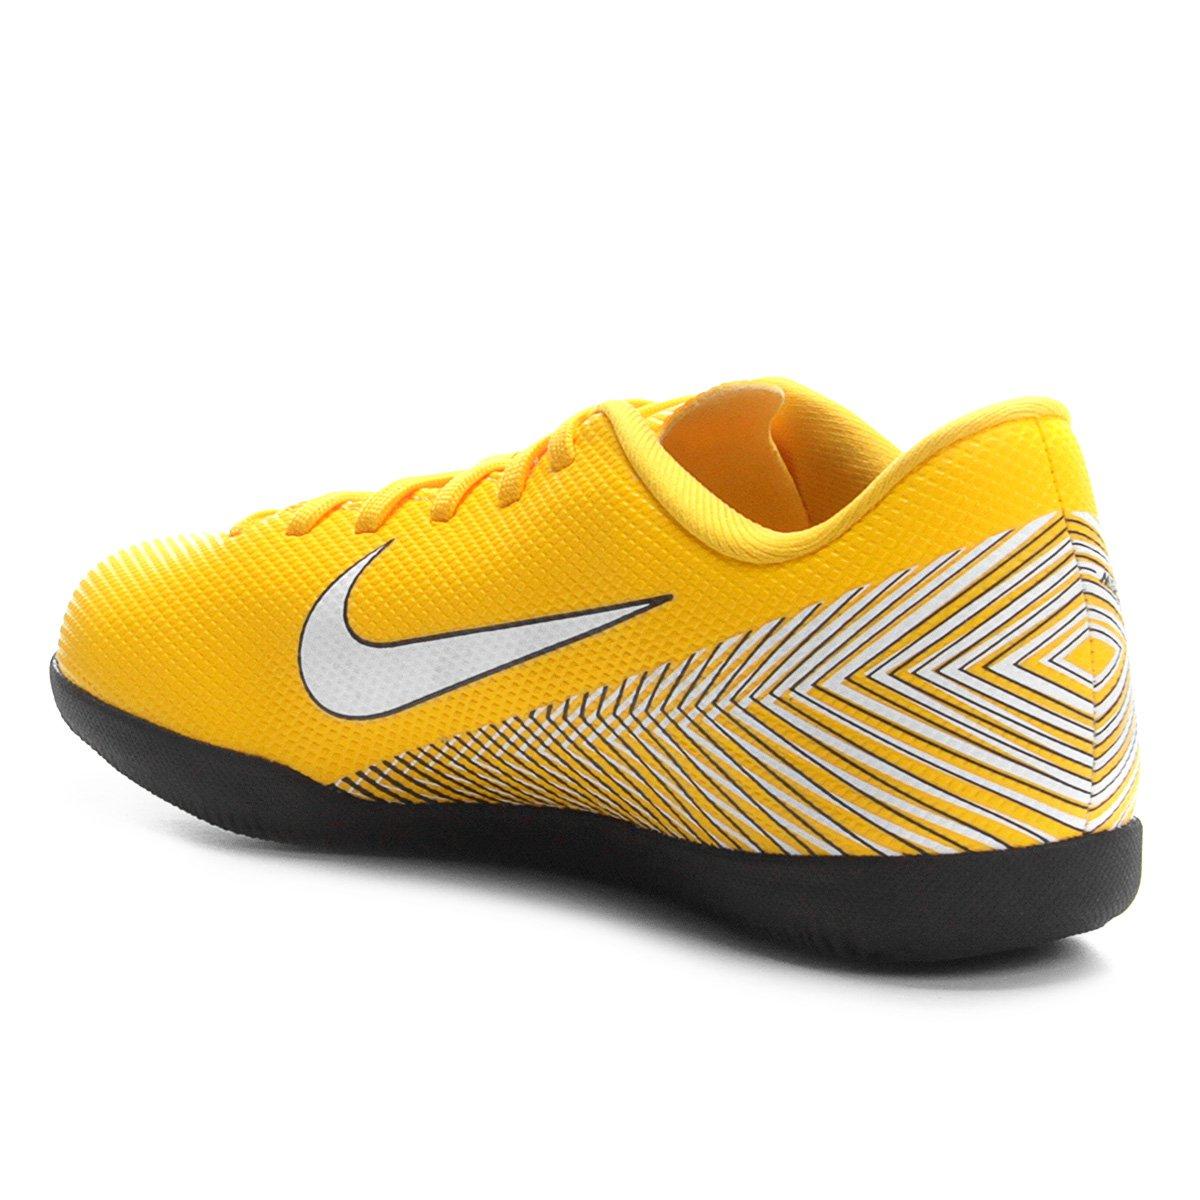 a910fb3ad8 ... Chuteira Futsal Infantil Nike Mercurial Vapor 12 Club GS Neymar IC ...